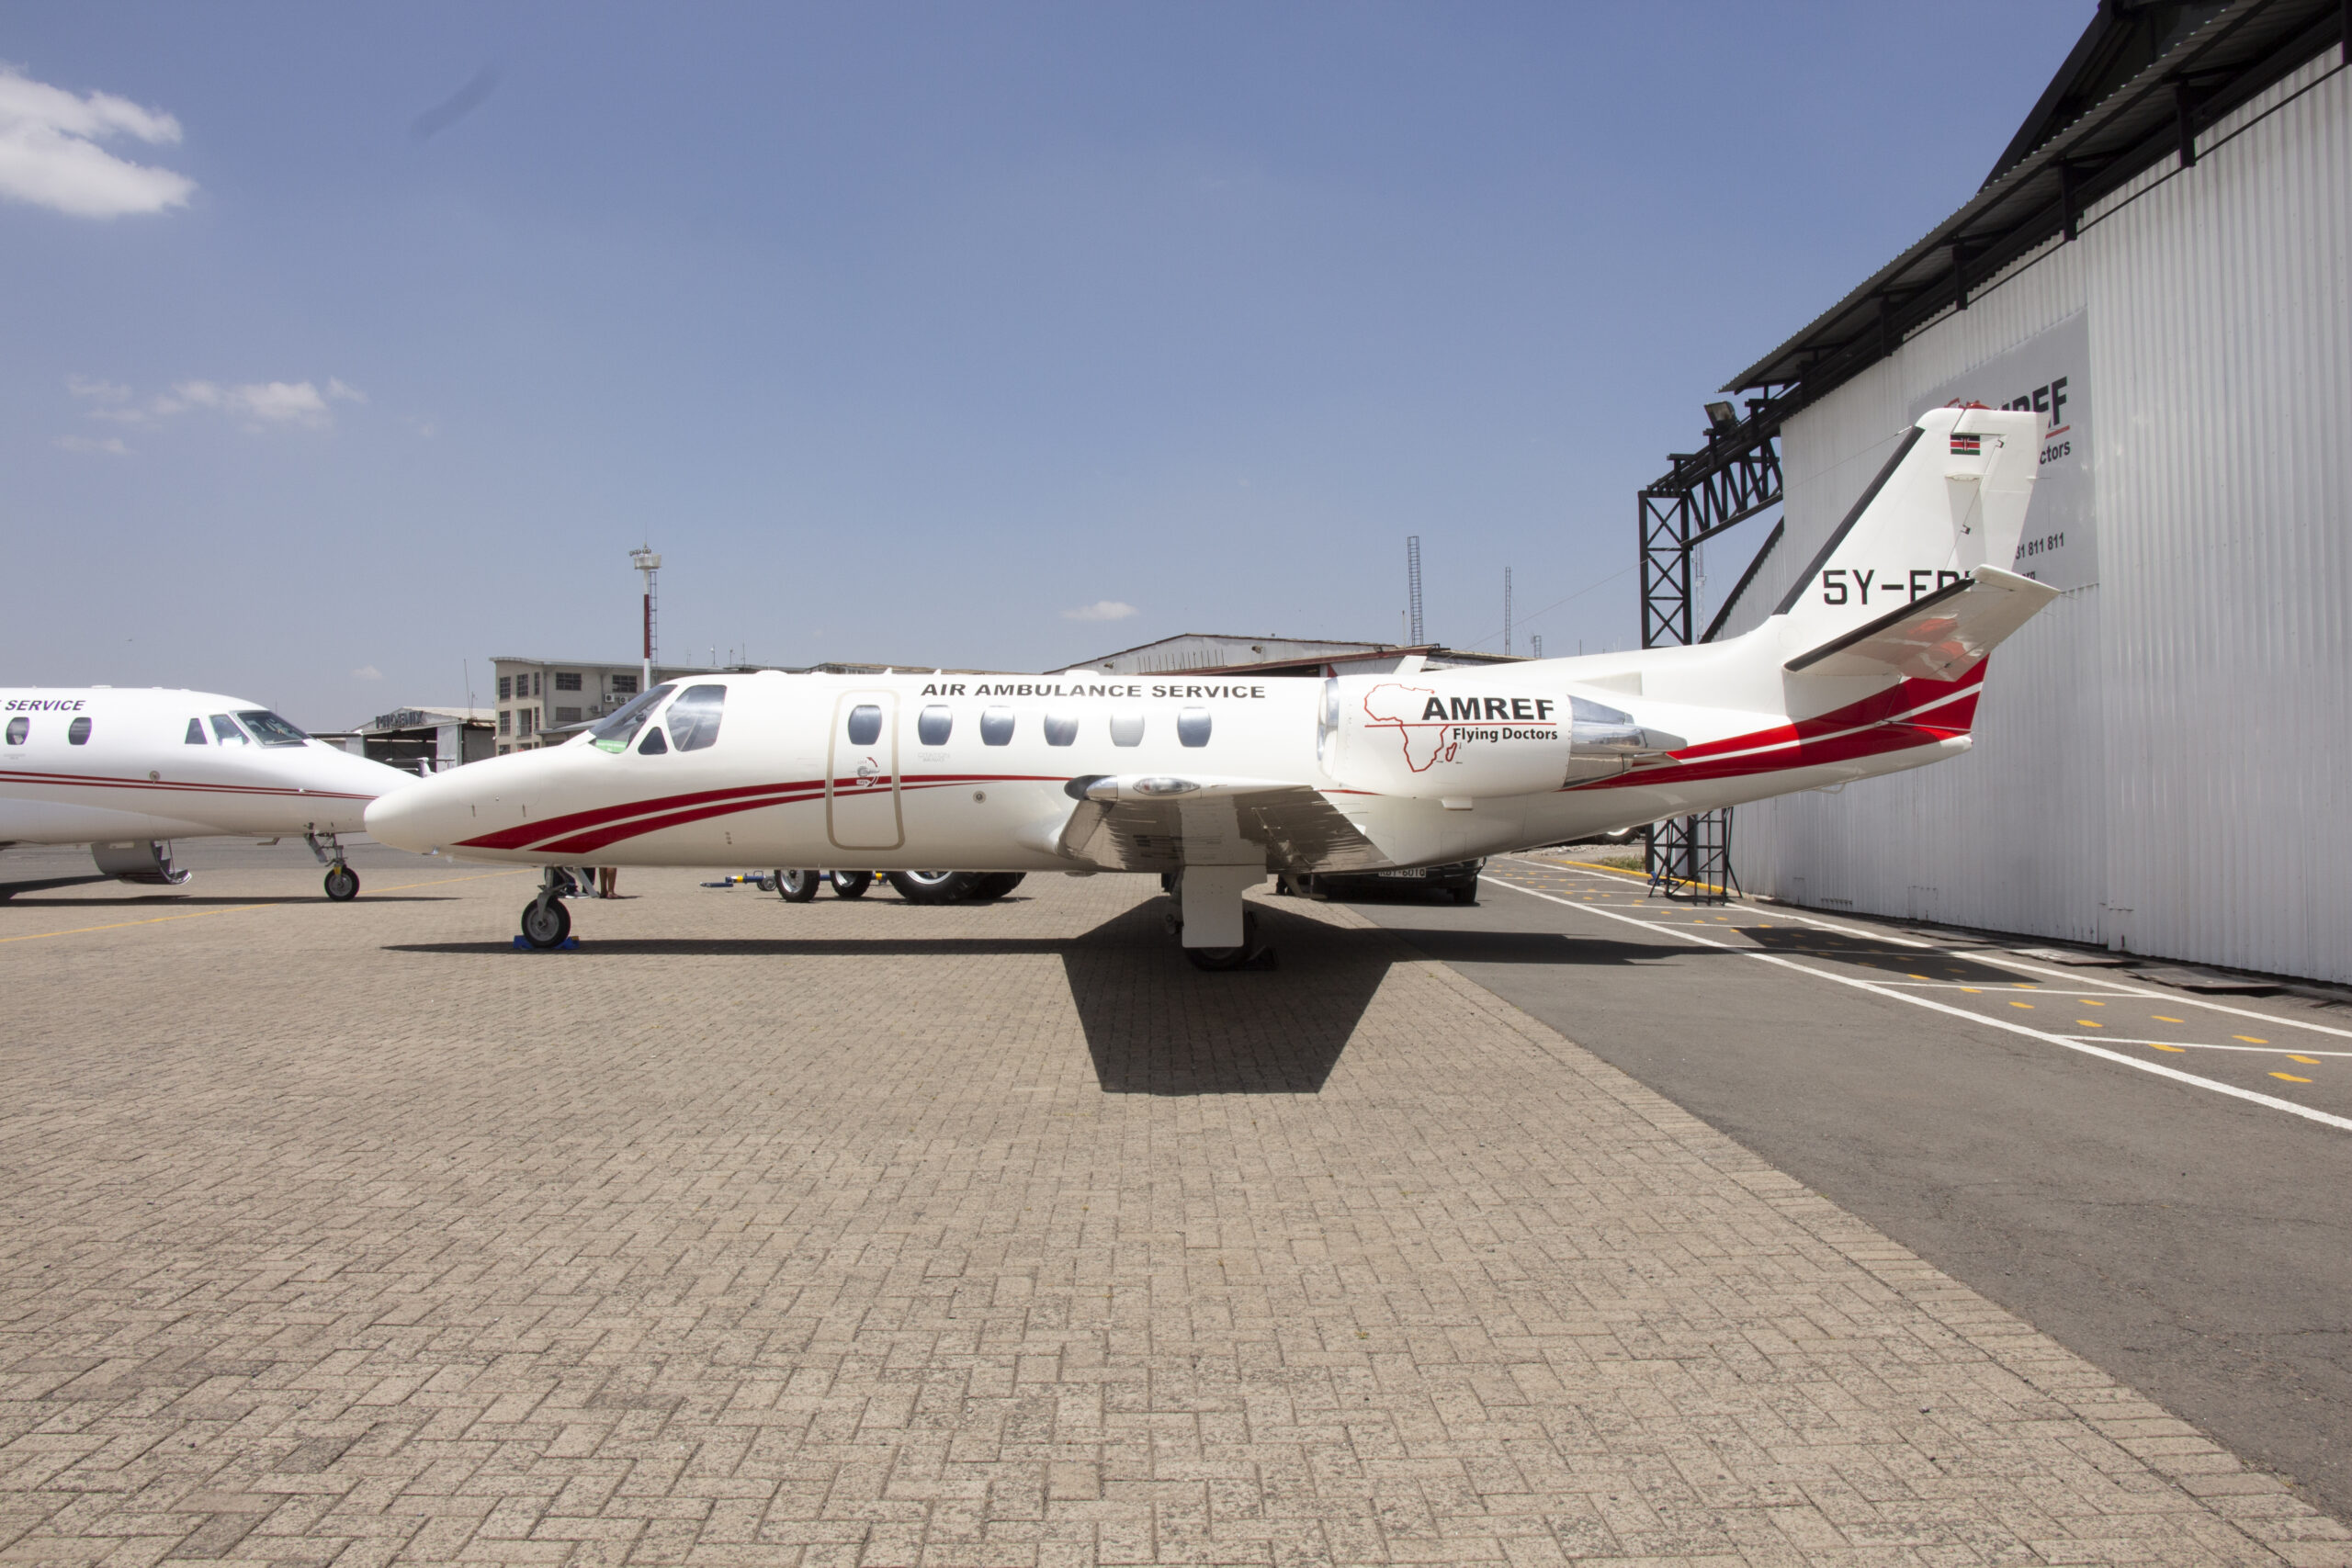 Amref Flying Doctors - Citation Bravo Aircraft model